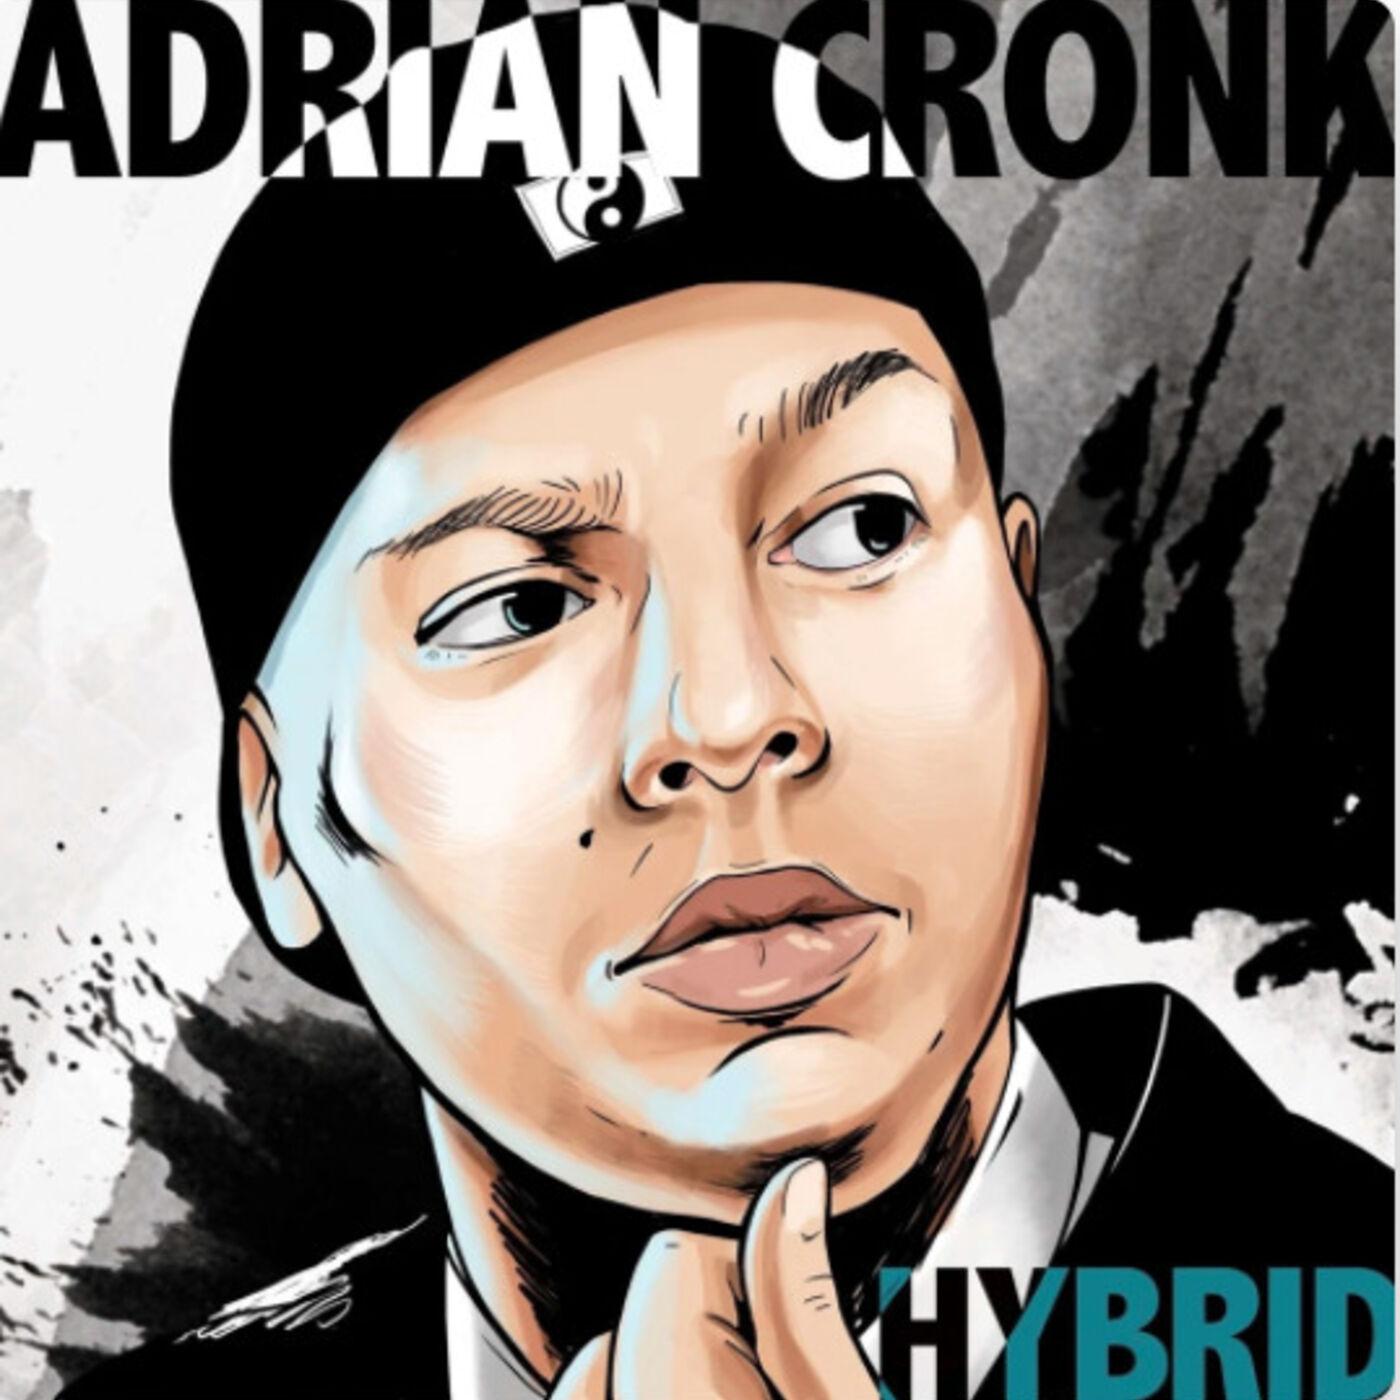 Comedian Adrian Cronk